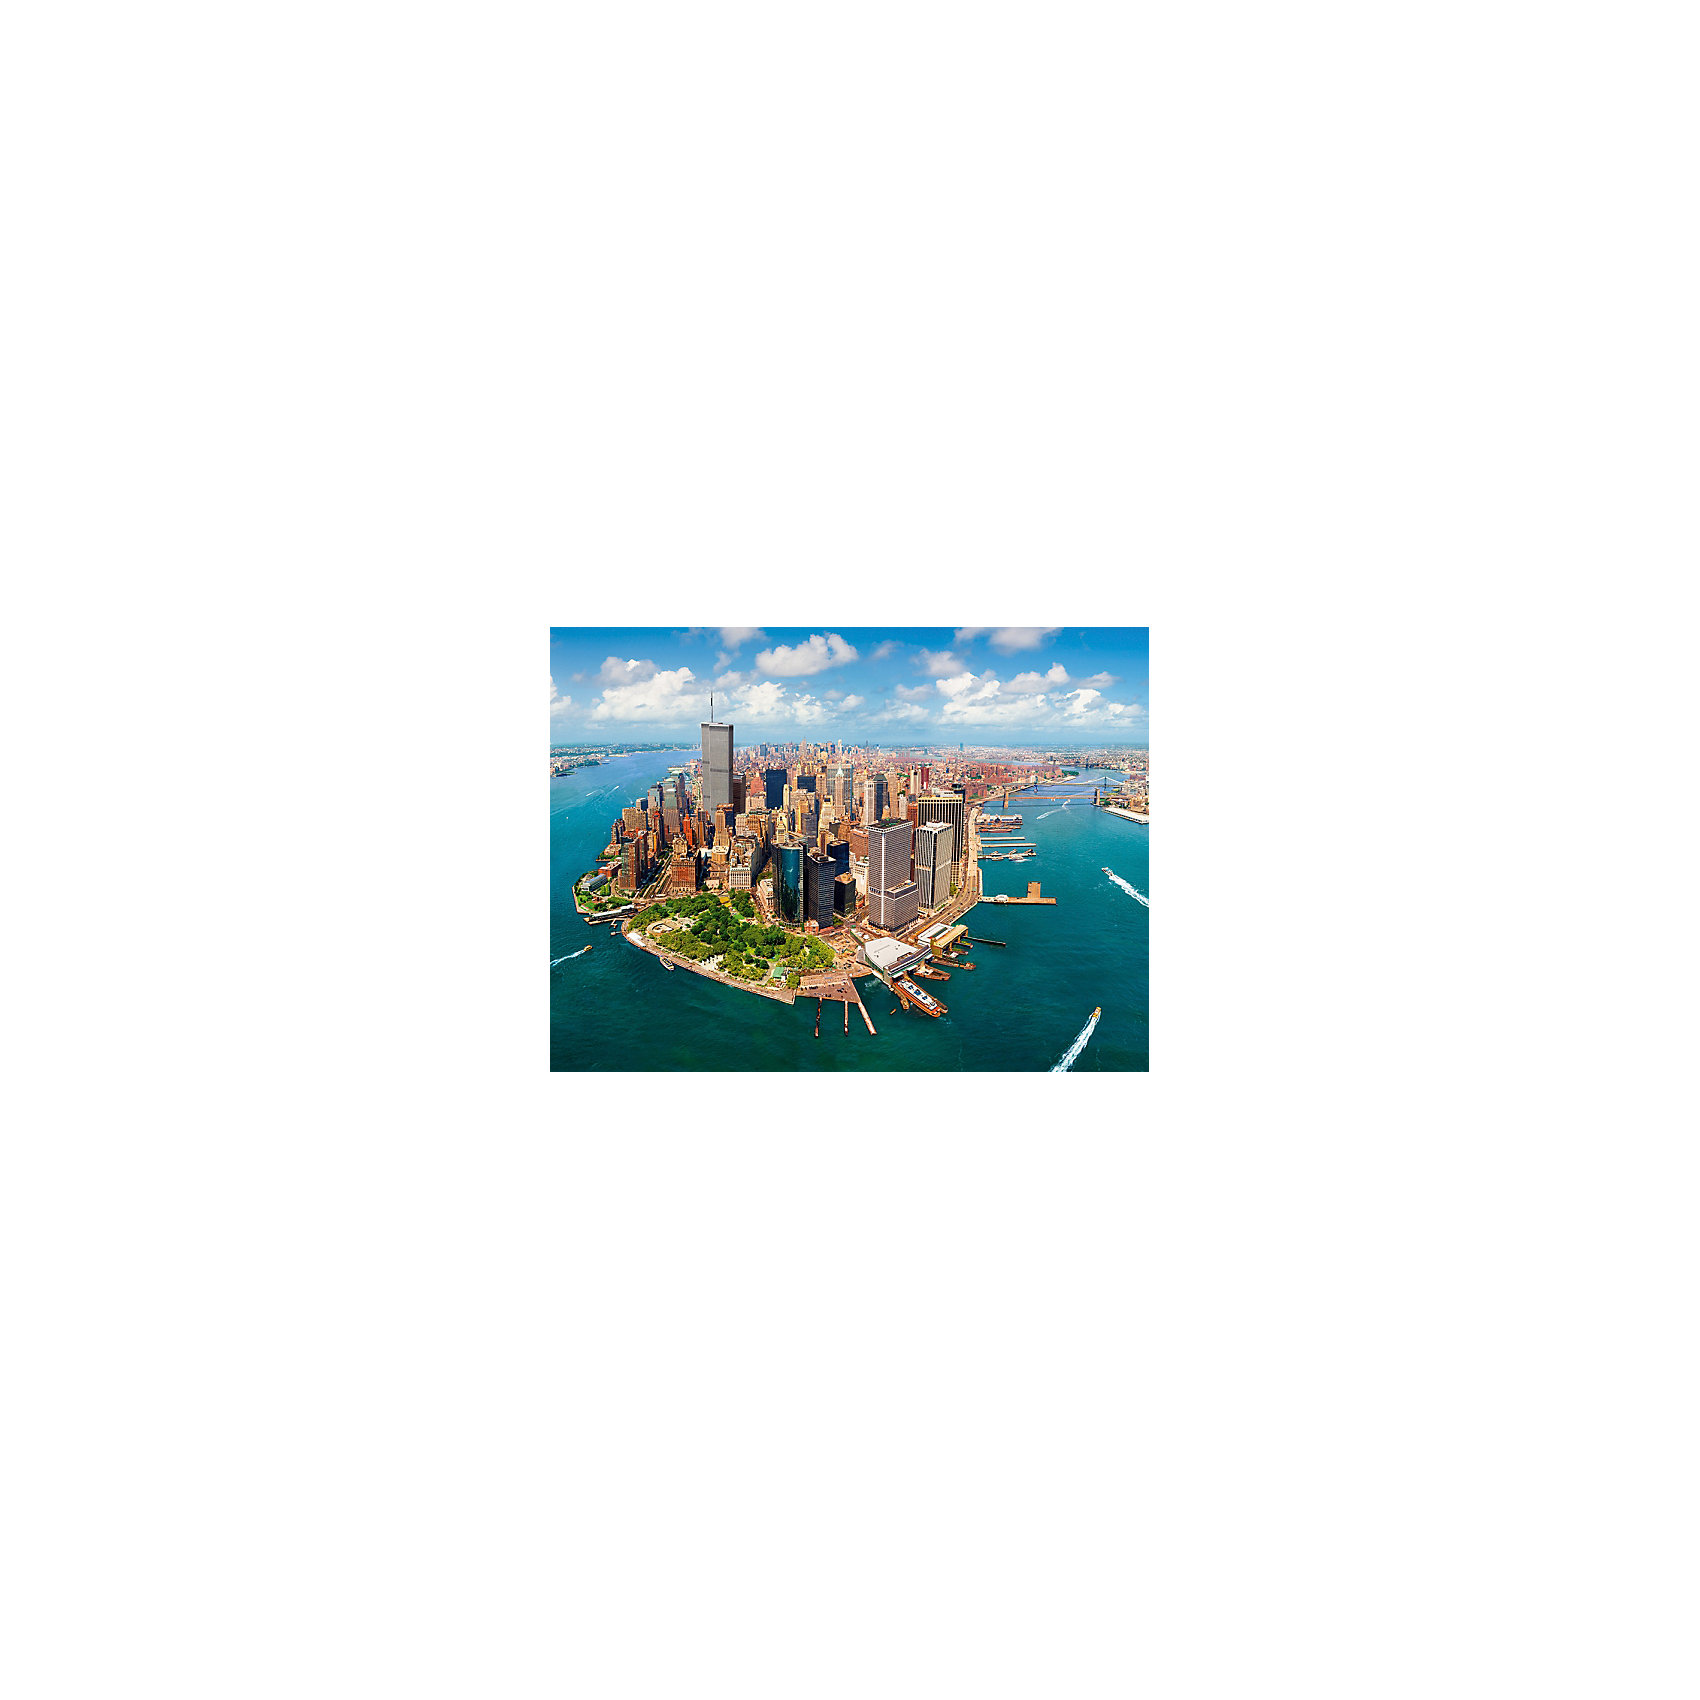 Castorland Пазл Манхэттен до 11.09.2001, 2000 деталей, Castorland пазл 2000 продуктовая лавка 17128